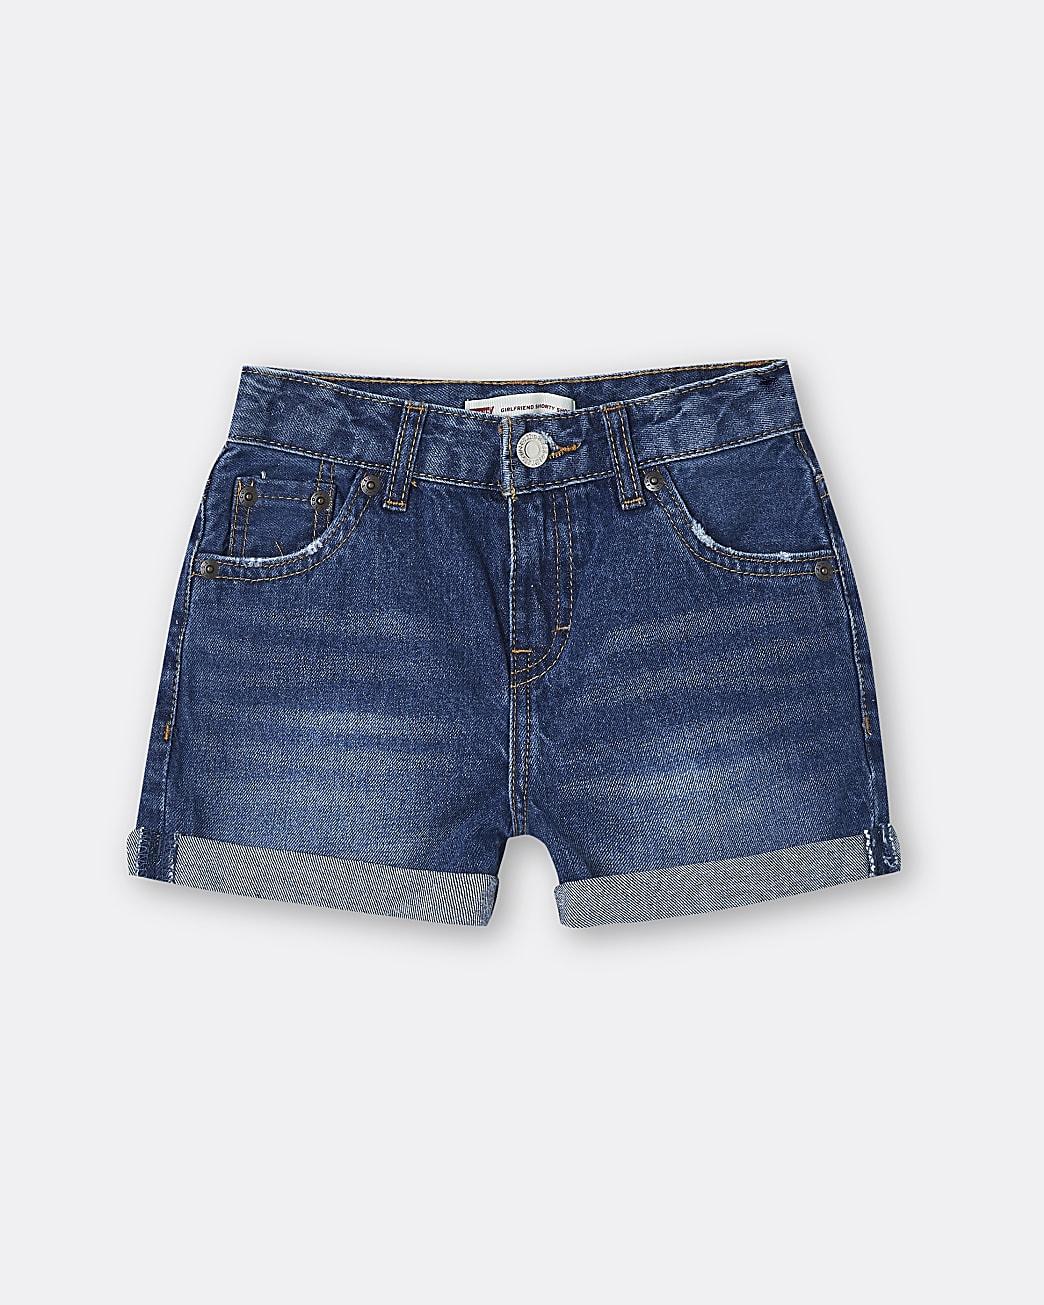 Girls blue Levi's denim shorts